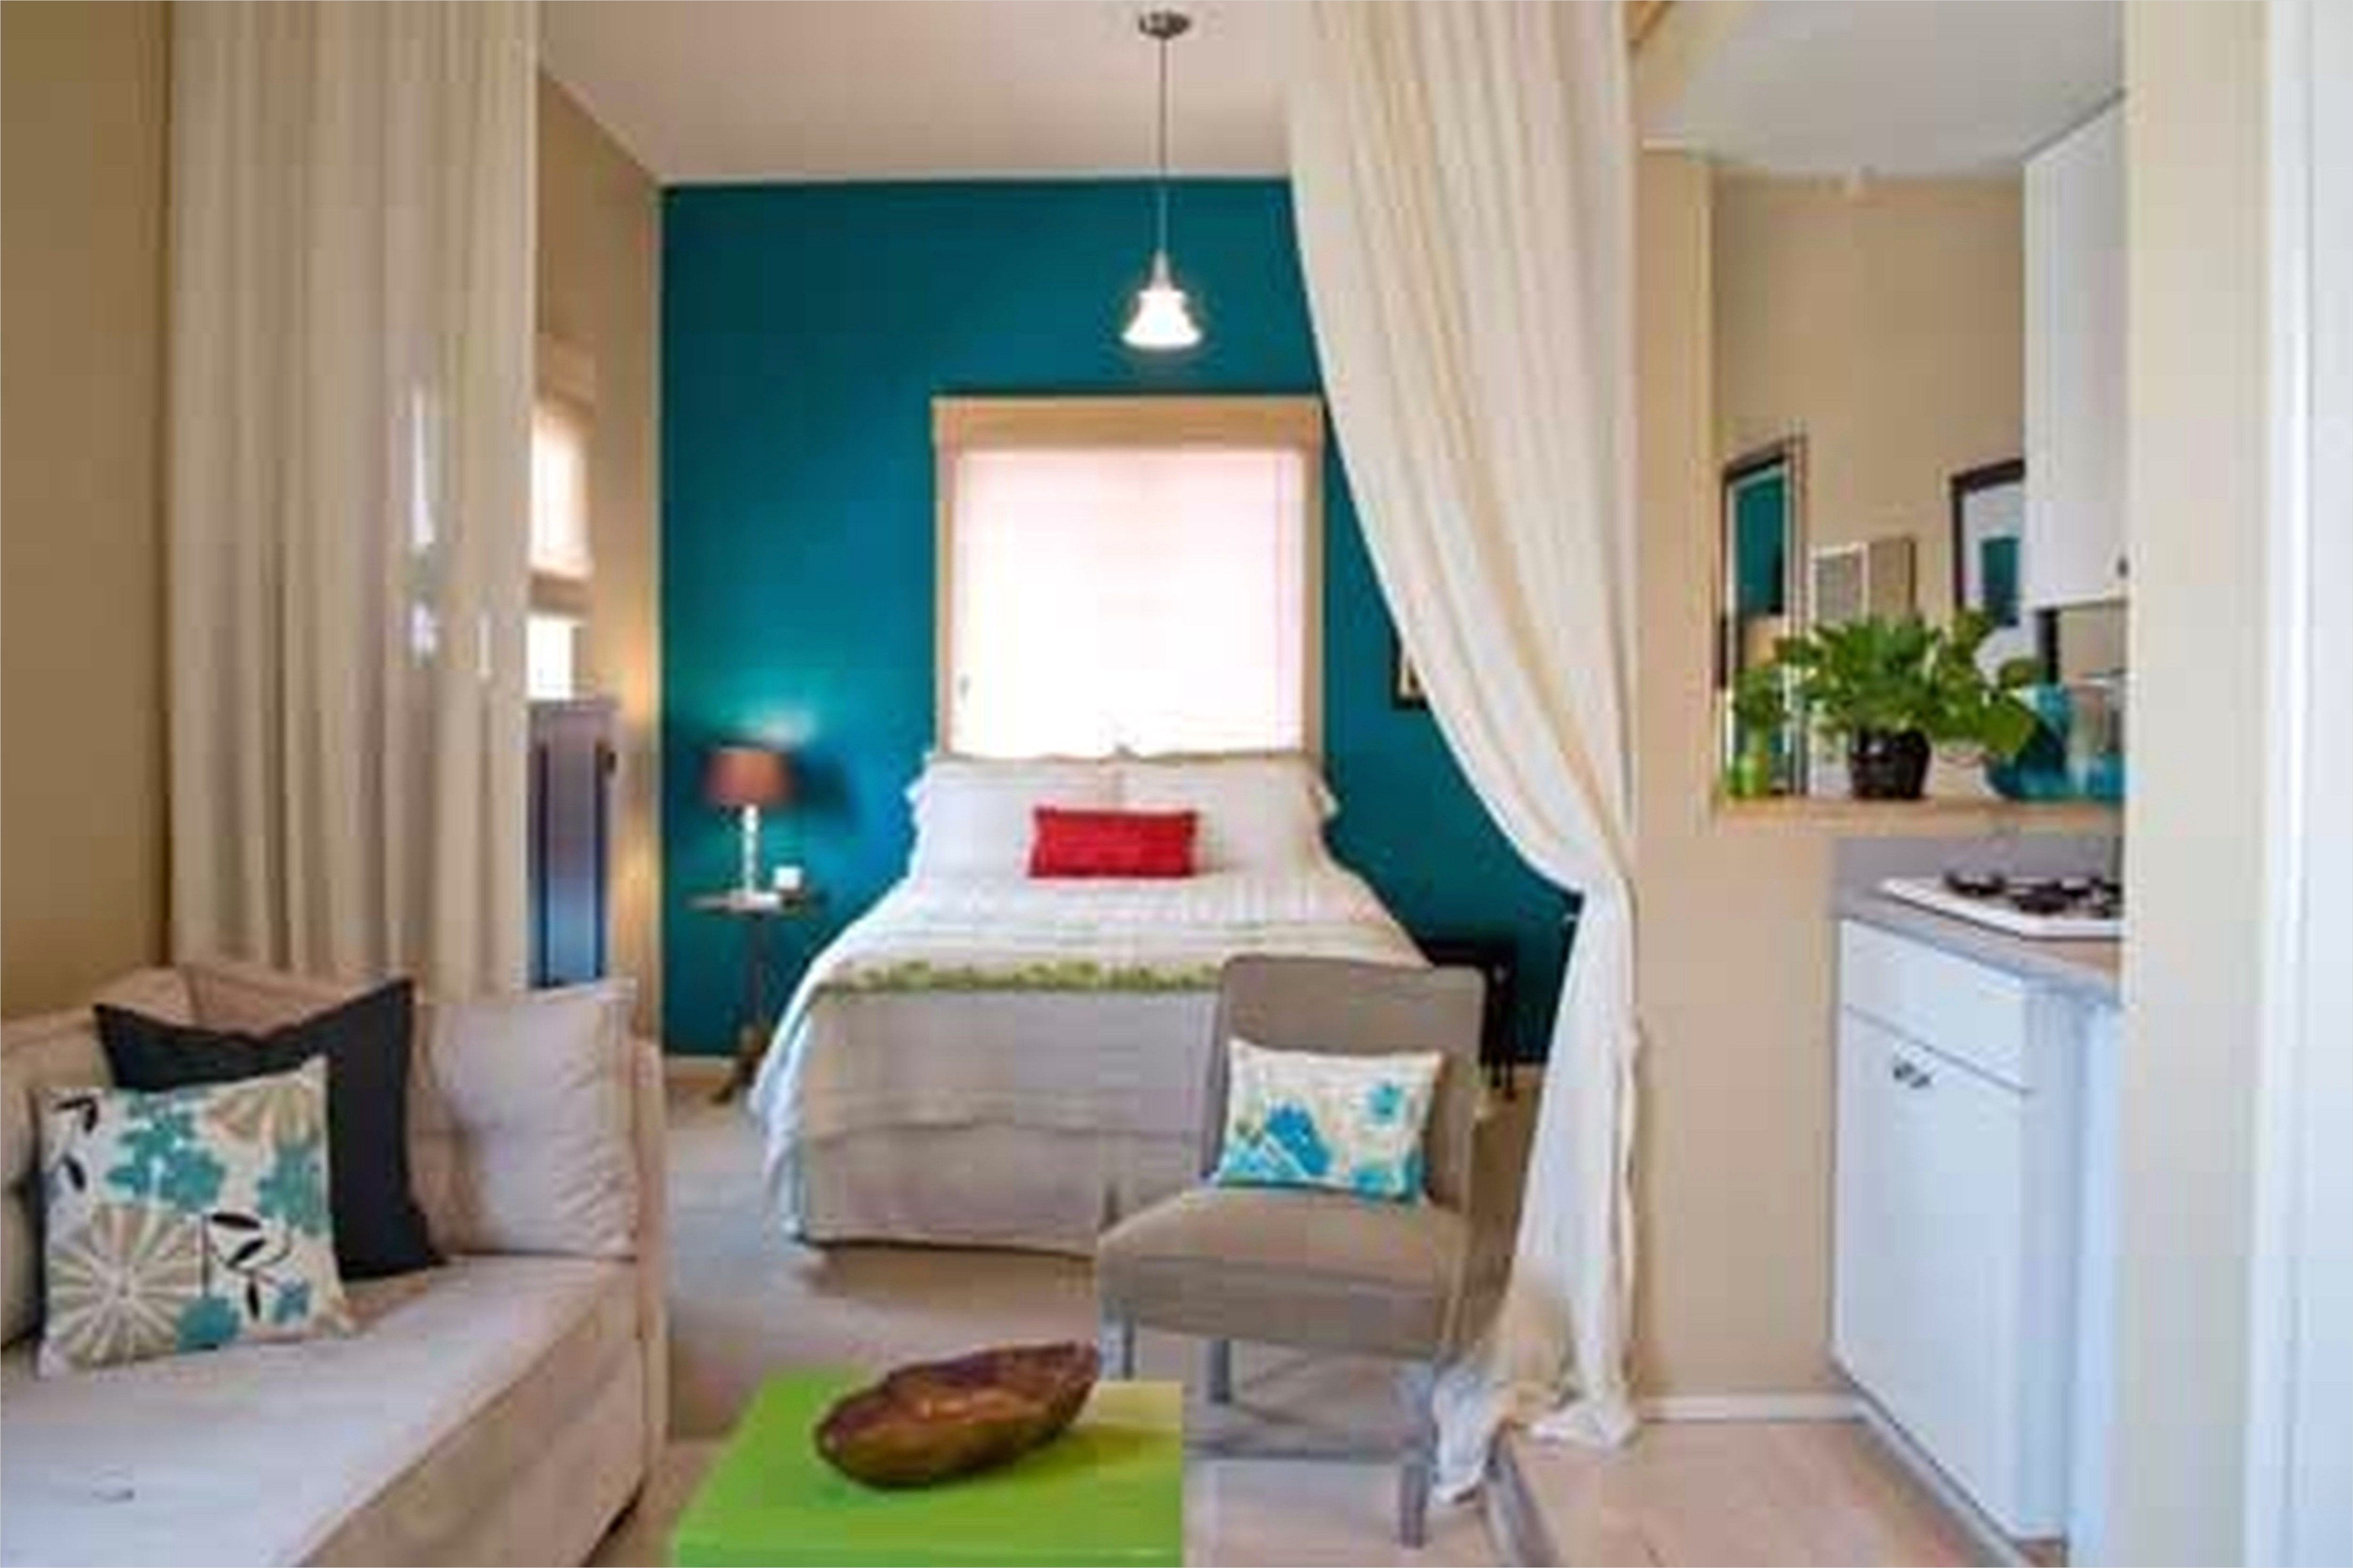 44 Inexpensive Apartment Decorating Ideas 43 Full Size ...